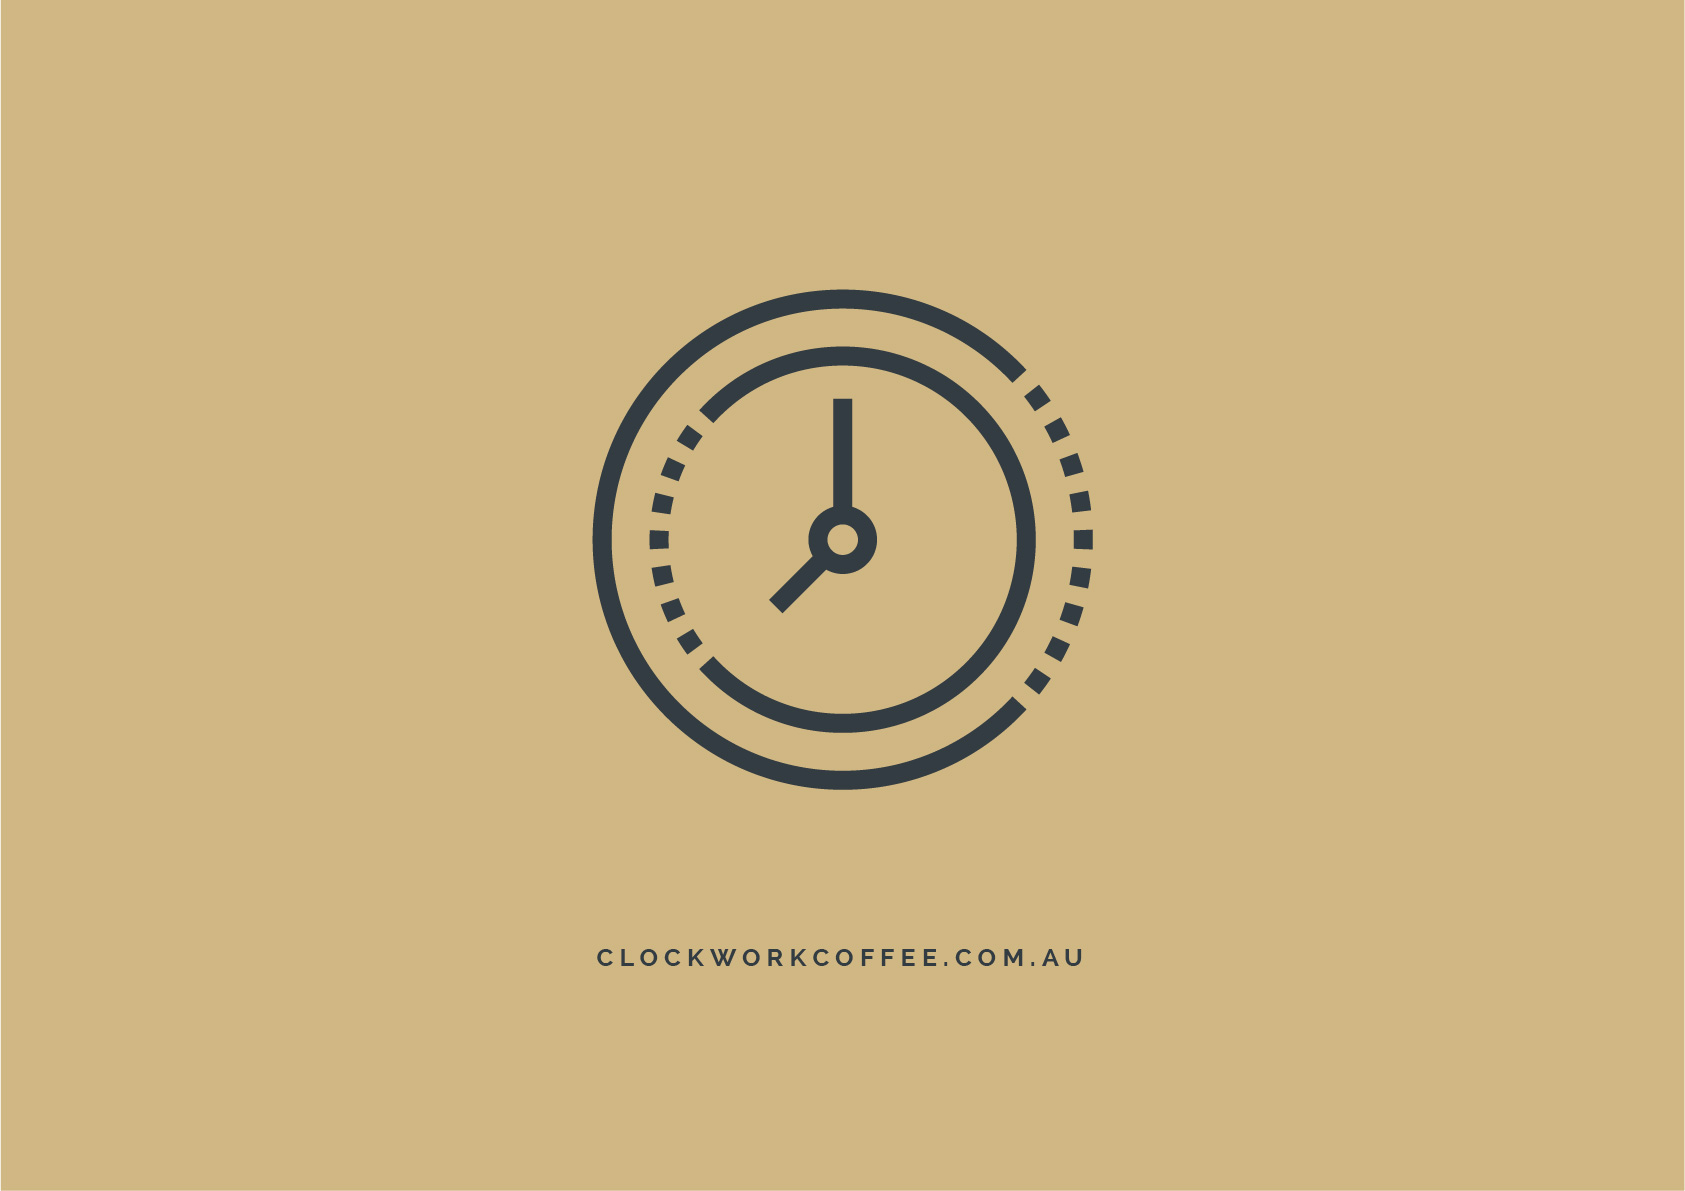 Clockwork Coffee  3.jpg